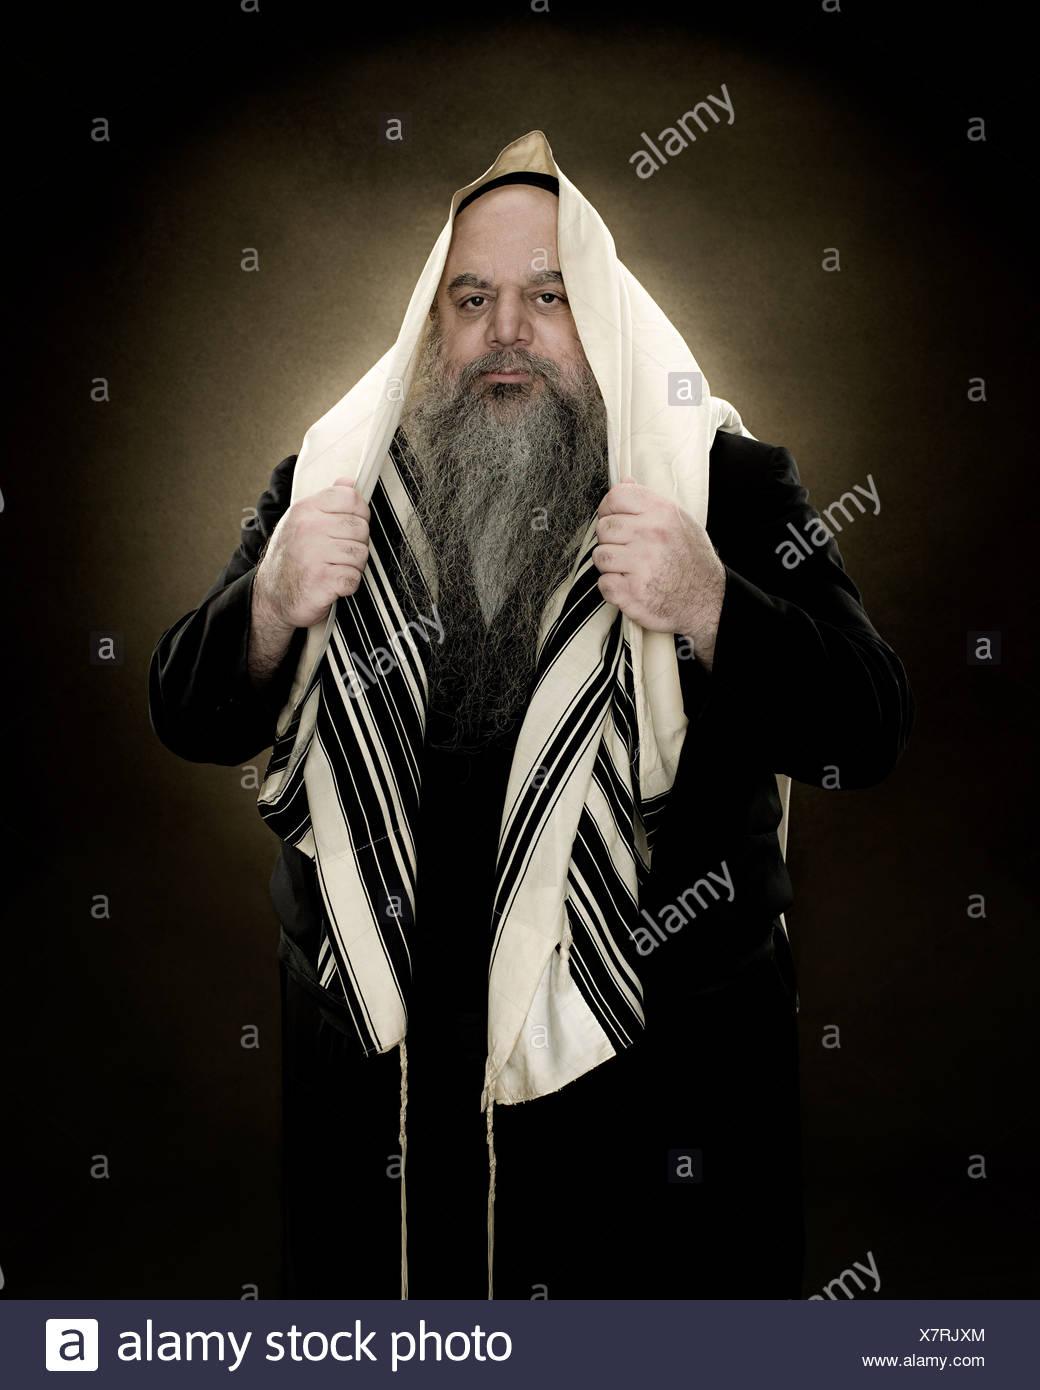 Prayer Shawl Stock Photos & Prayer Shawl Stock Images - Alamy